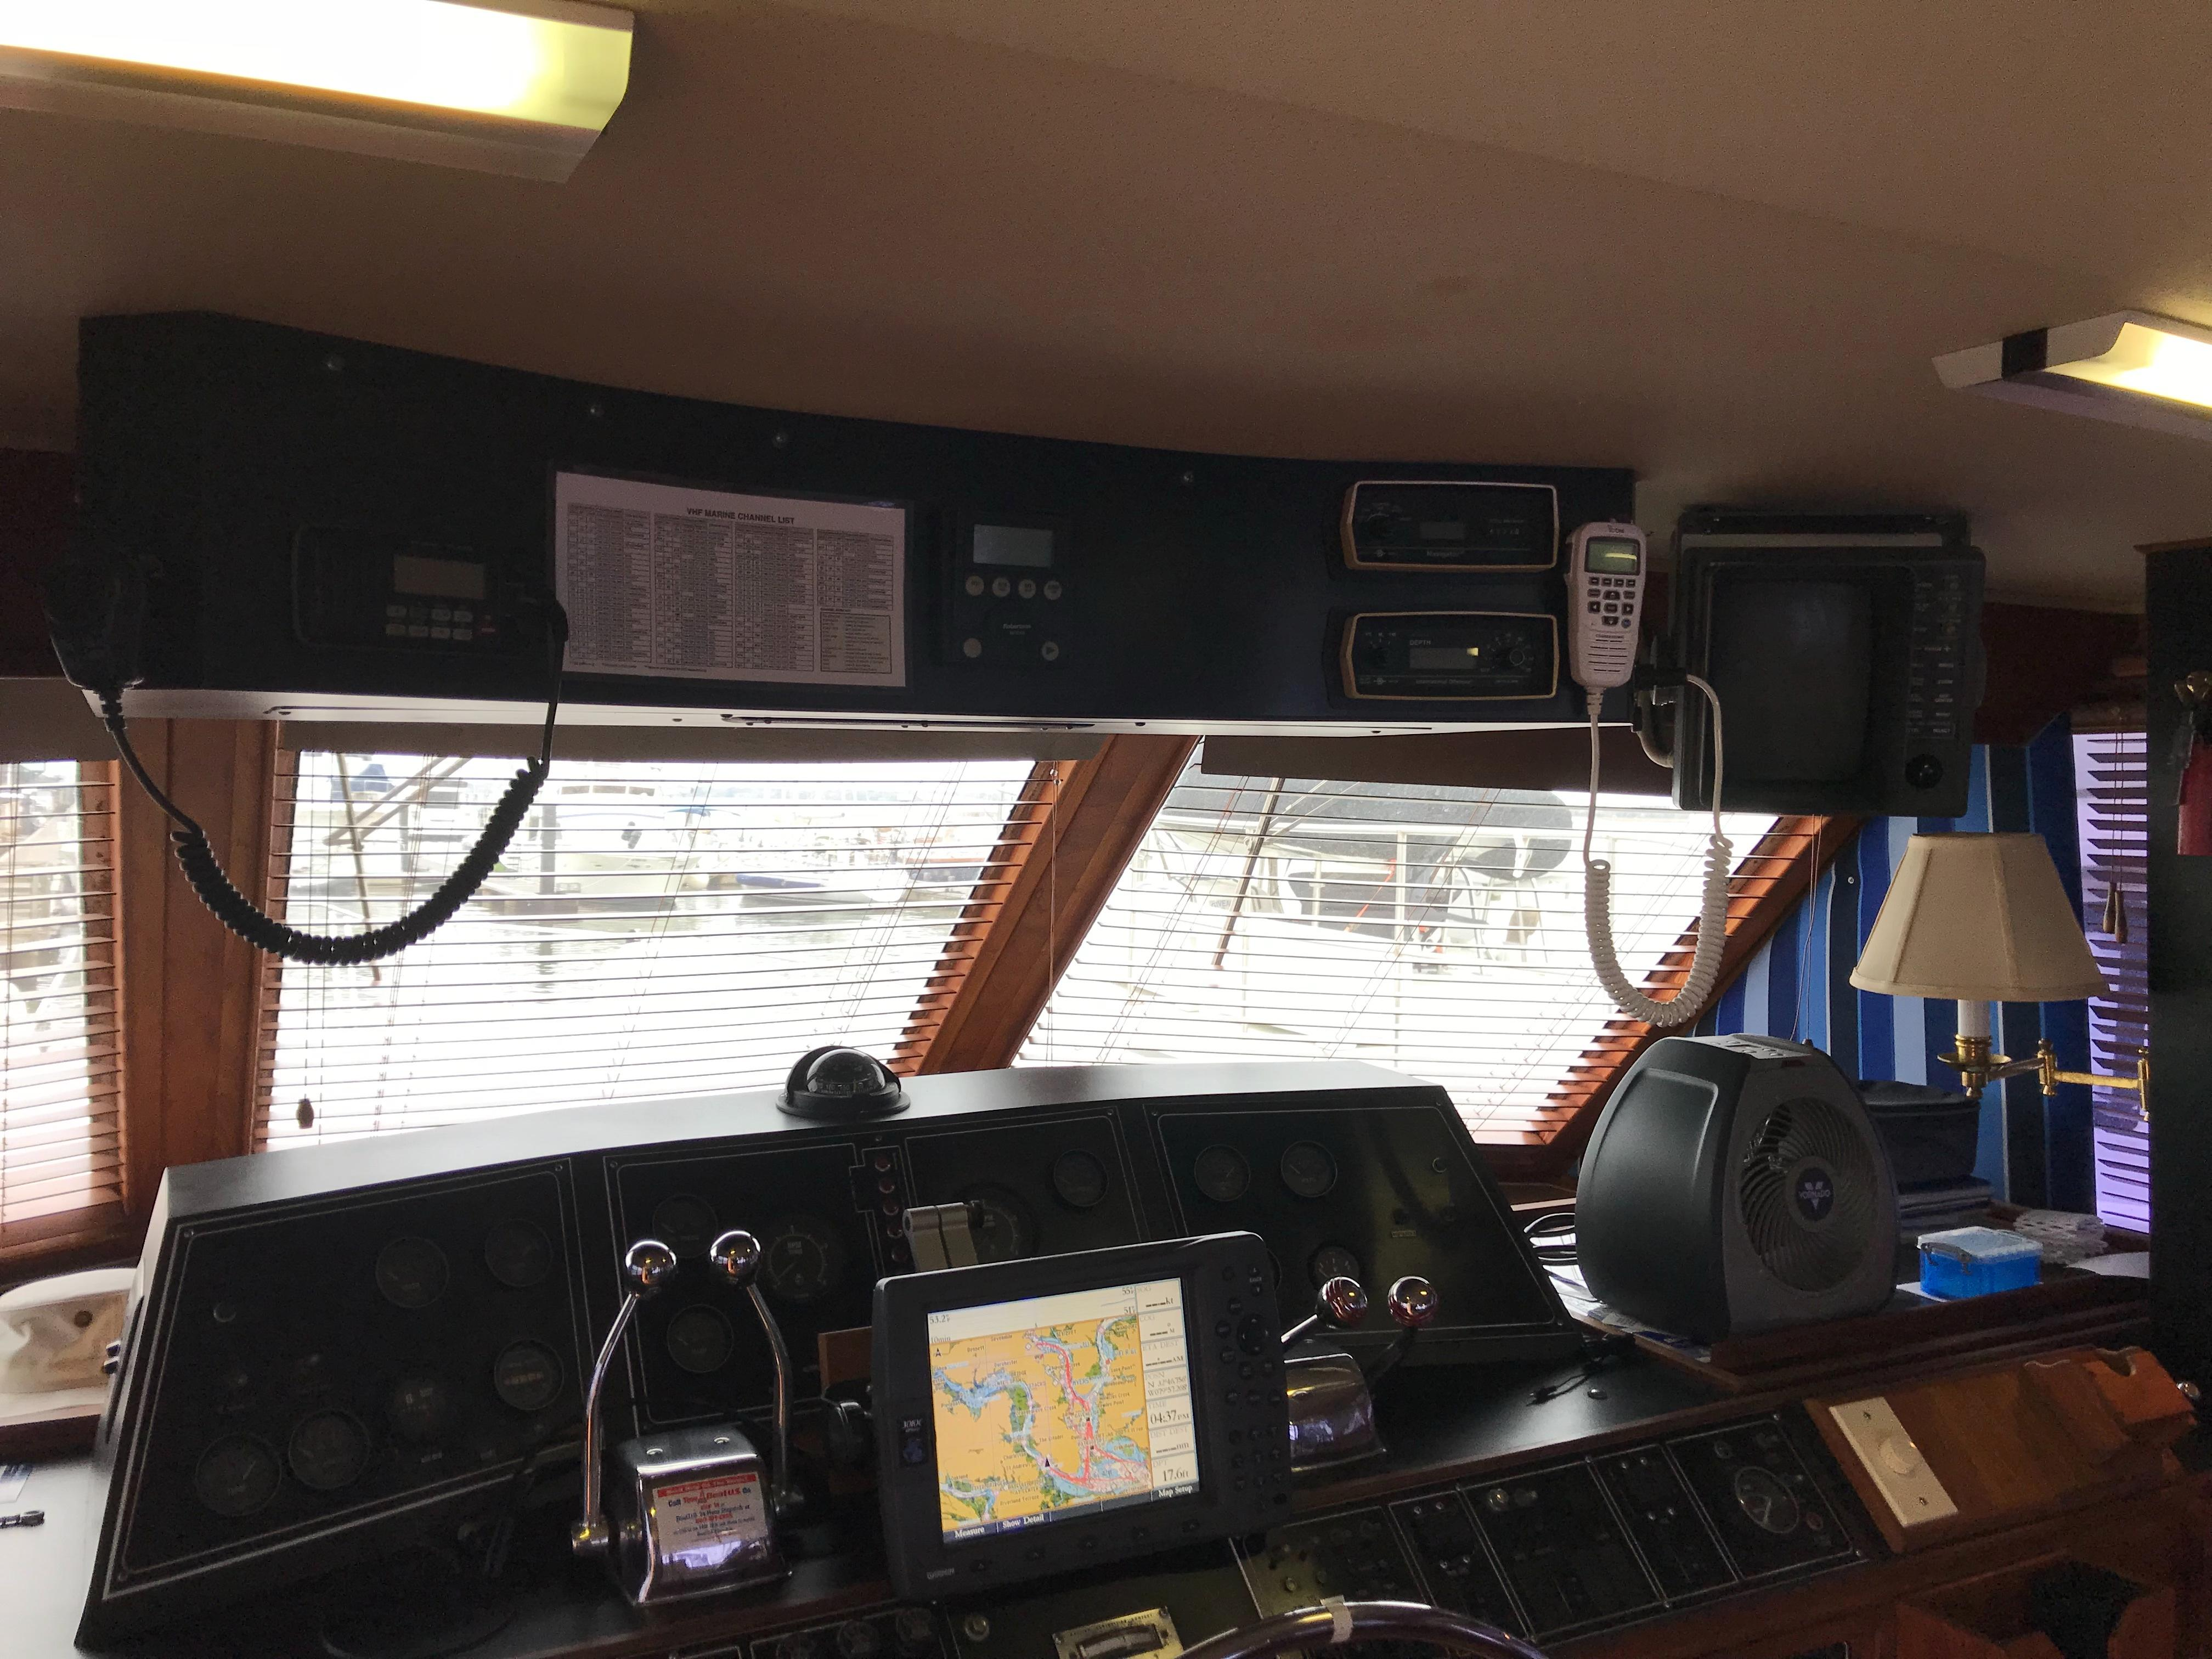 Chris-craft 46 Constellation - Electronics Panel above Lower Helm